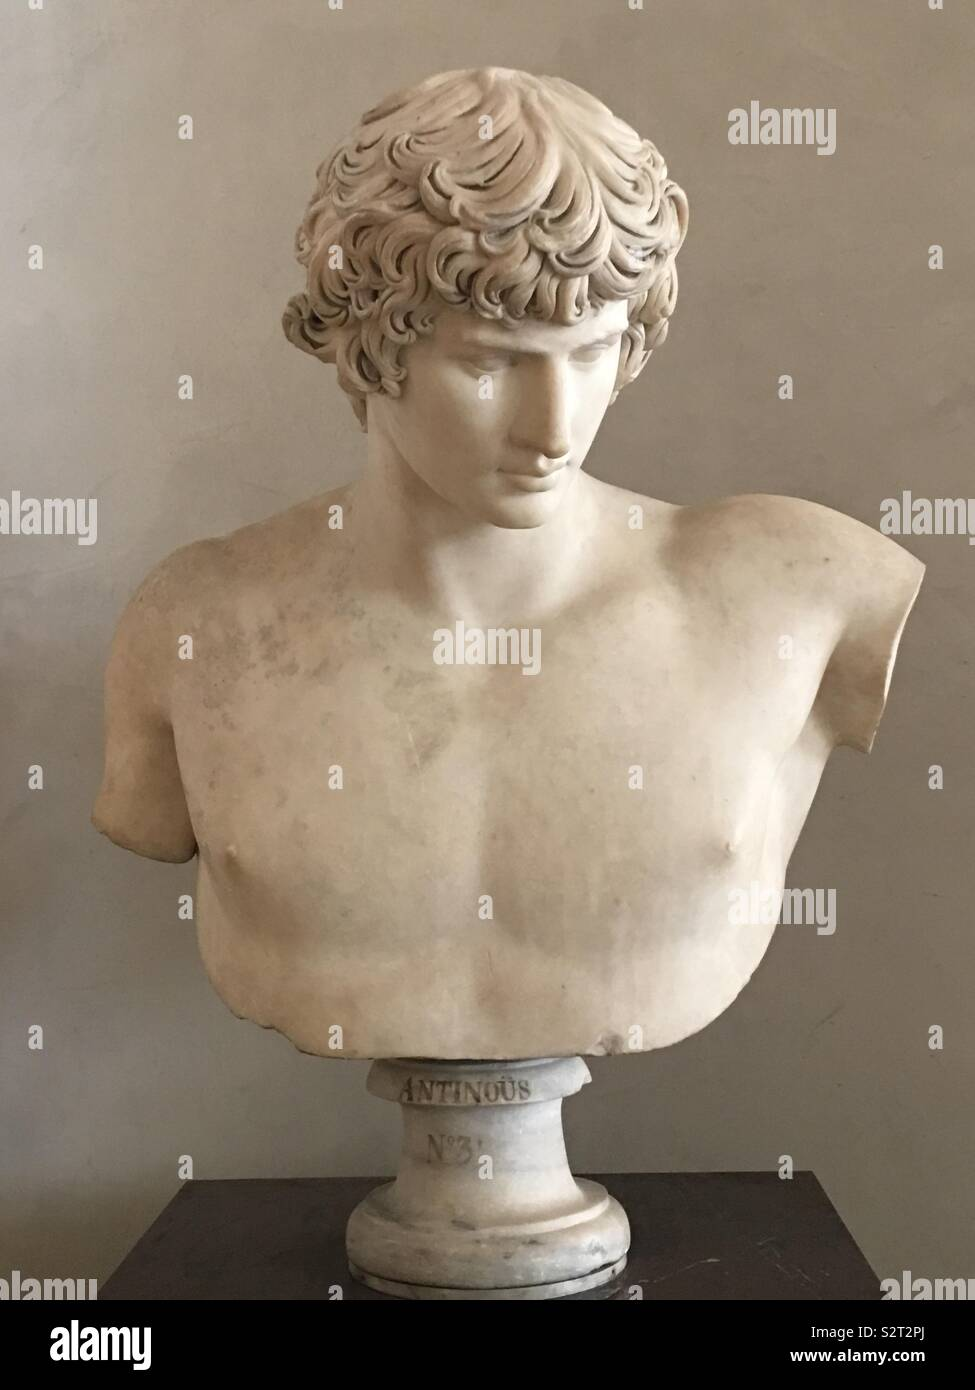 Antinous Mondragone, Louvre, Paris - Stock Image